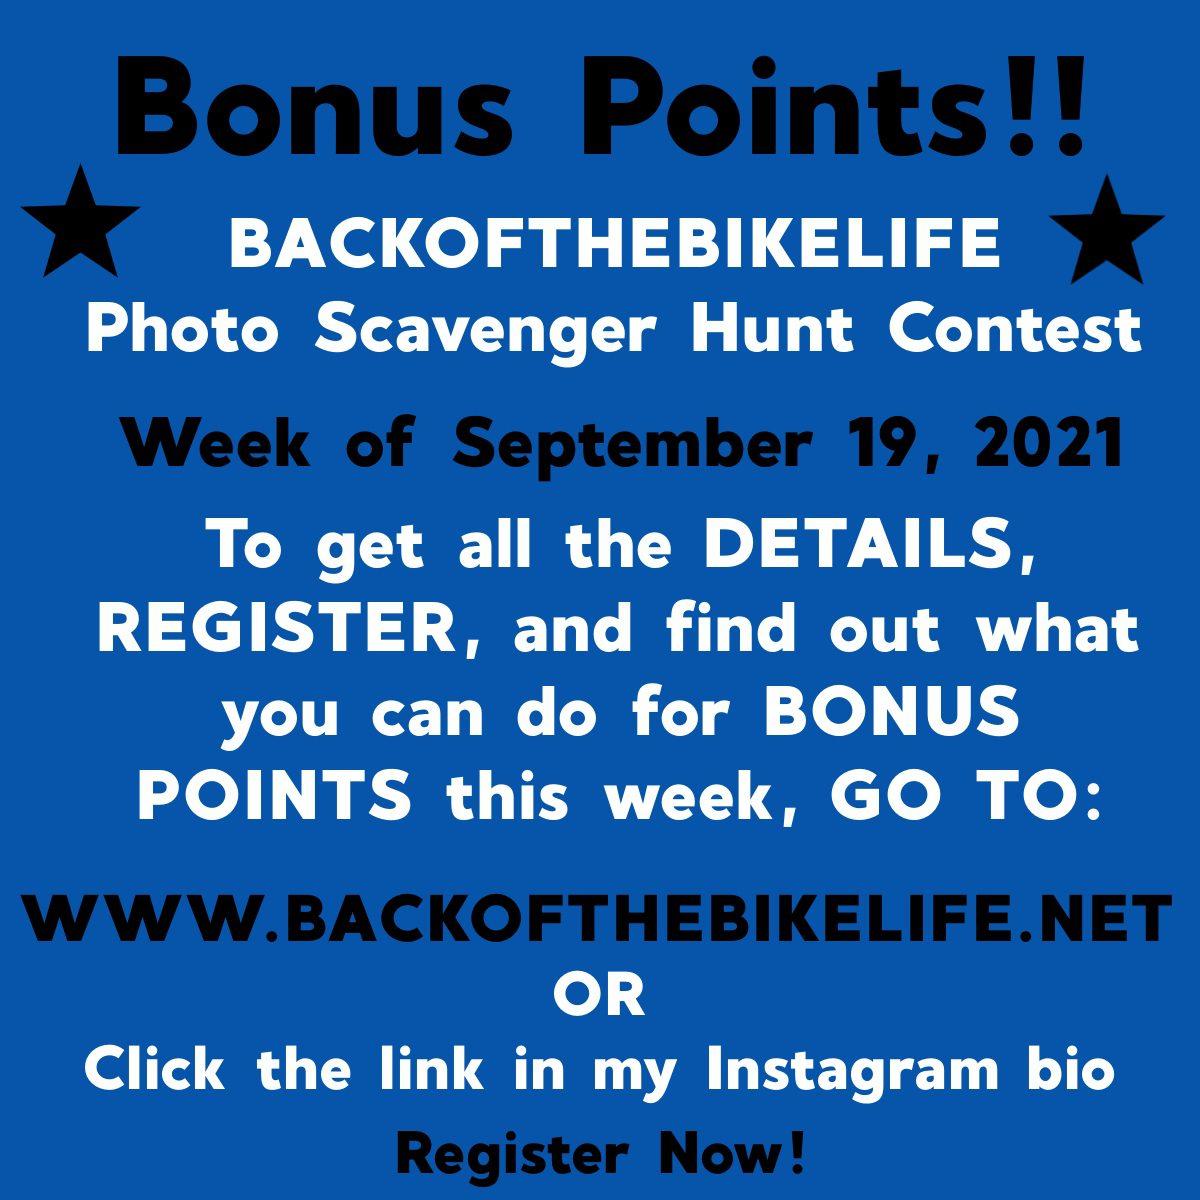 Bonus Points-Photo Scavenger Hunt Week of 9/19/2021